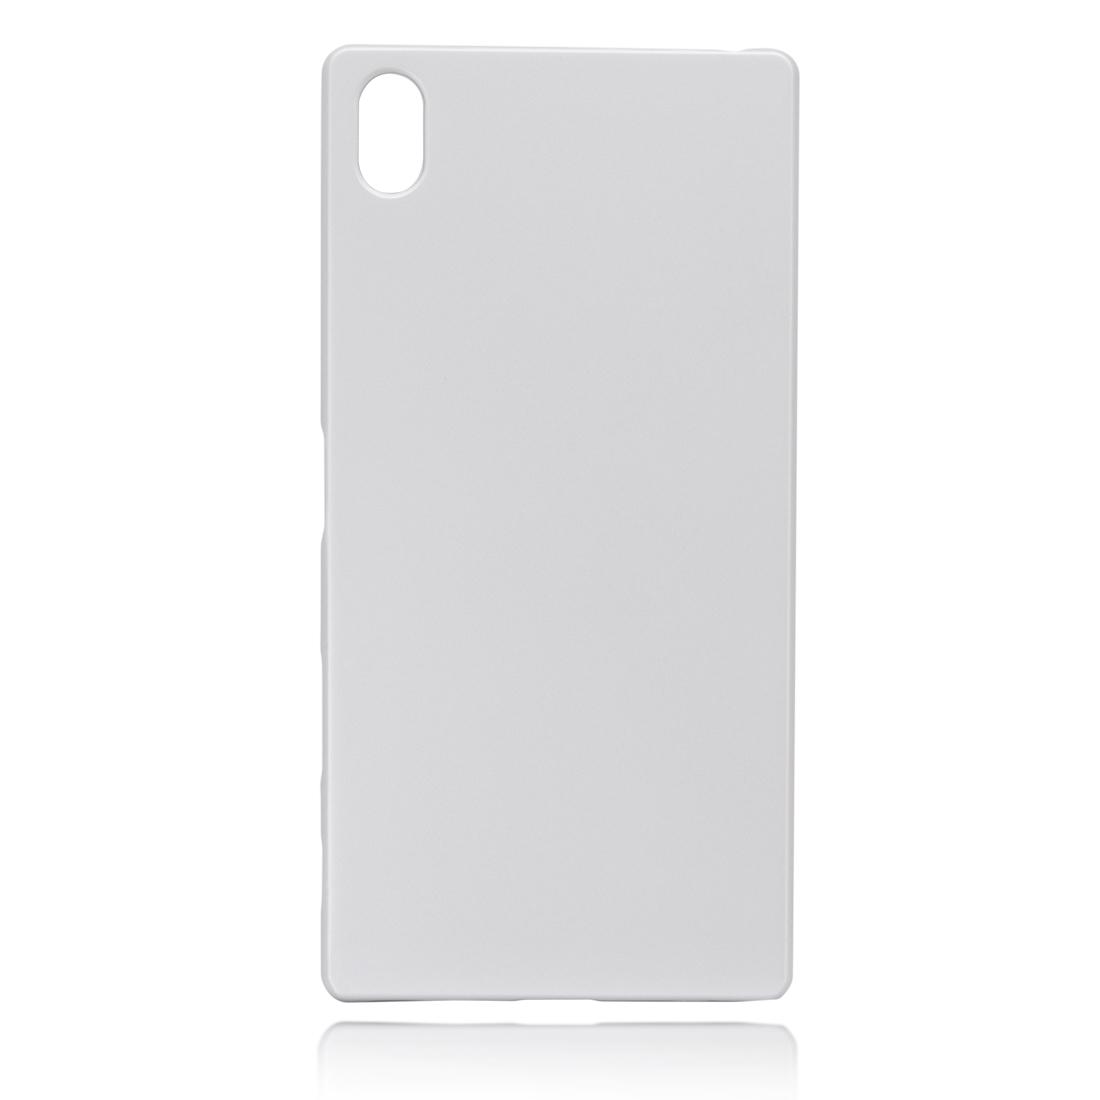 Пластиковый чехол серый для Xperia Z5 Premium в Sony Centre Воронеж